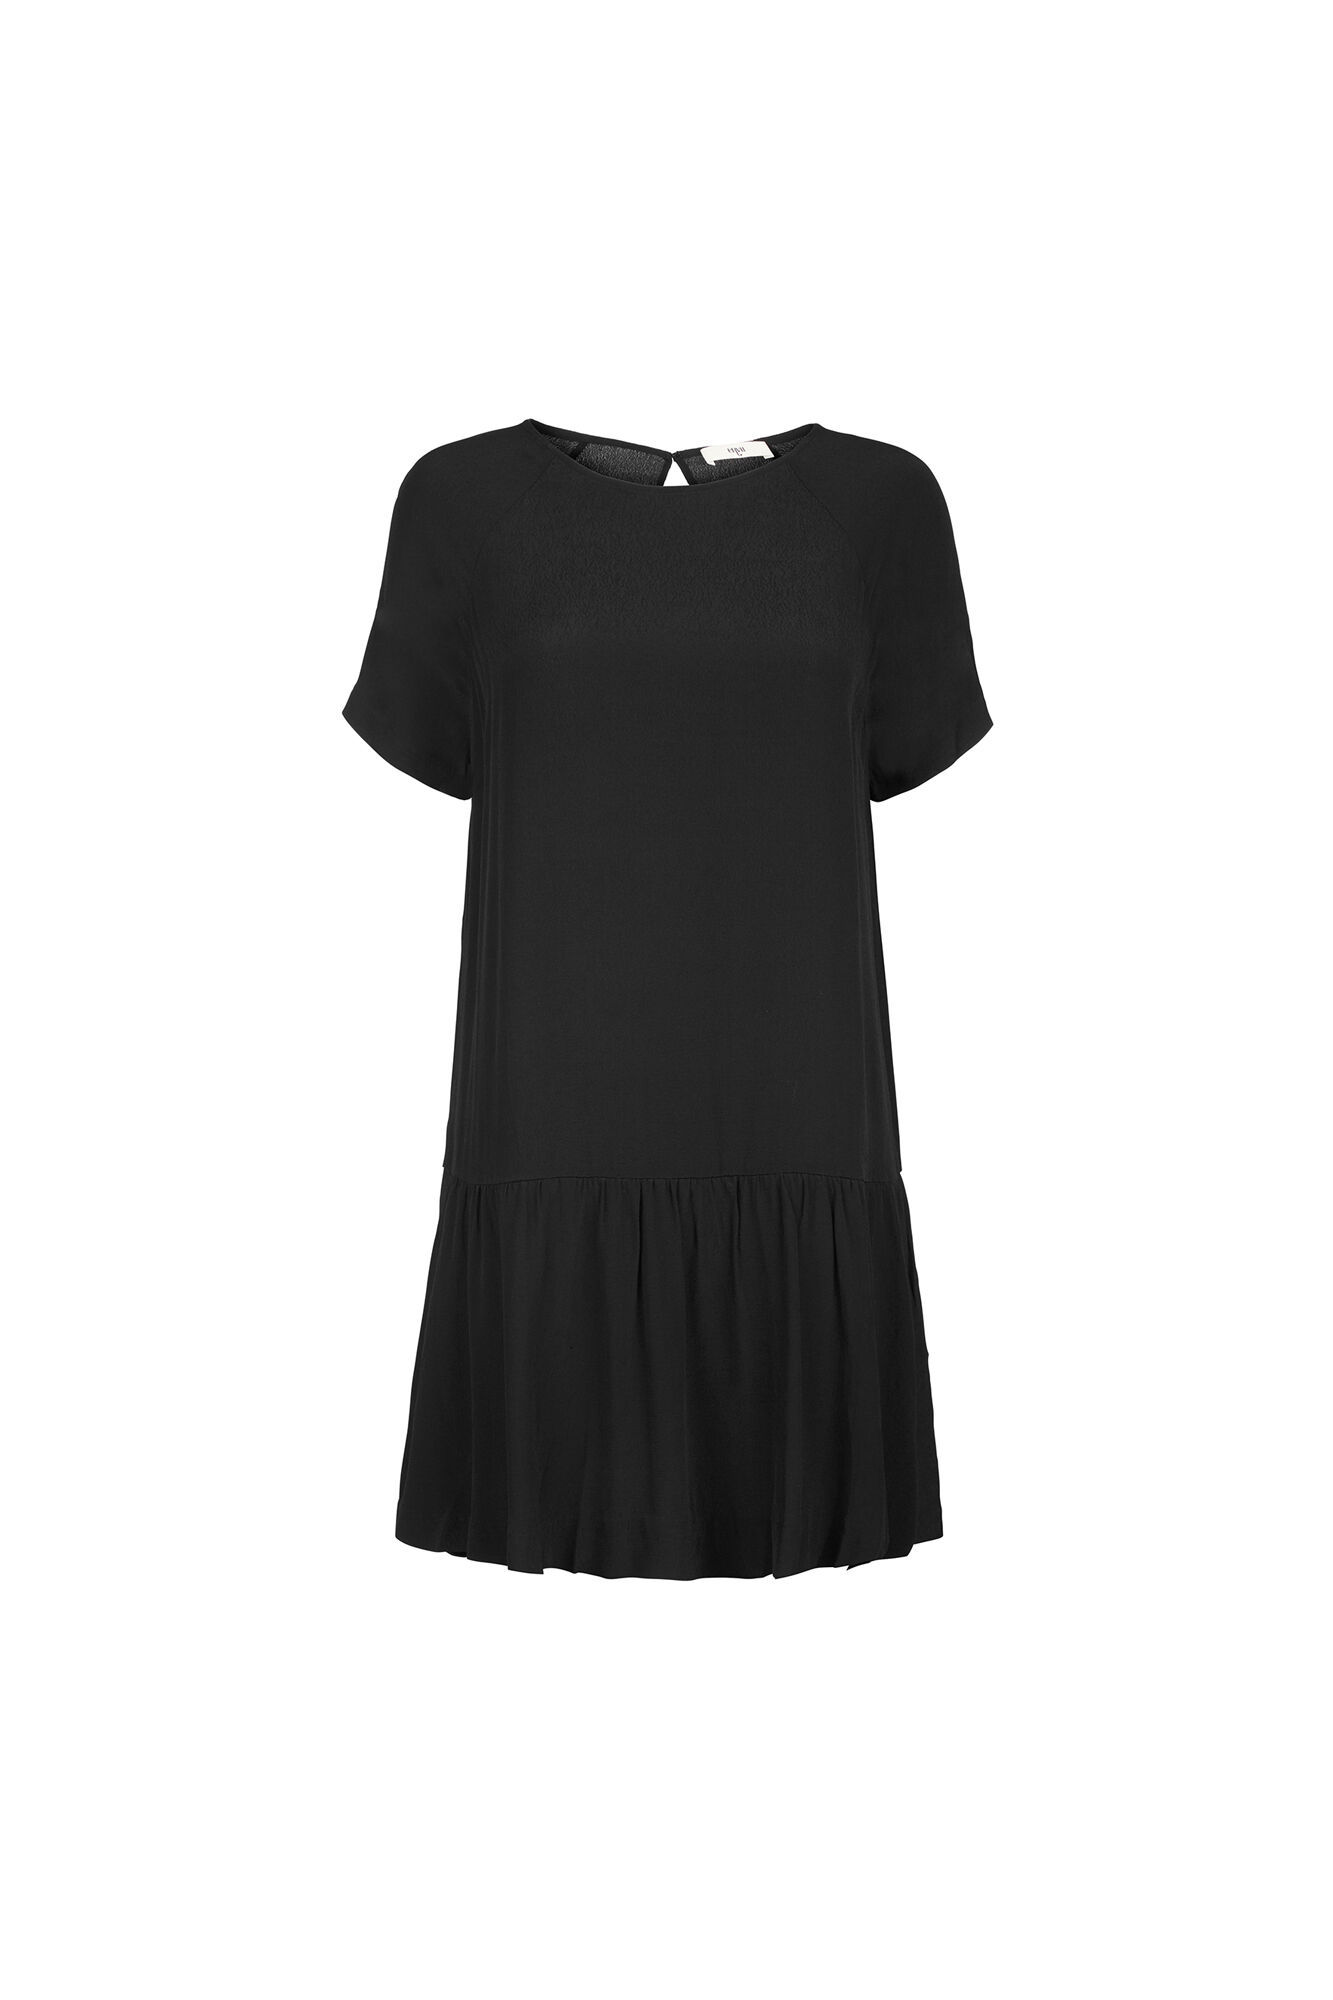 ENLOTUS DRESS 6257